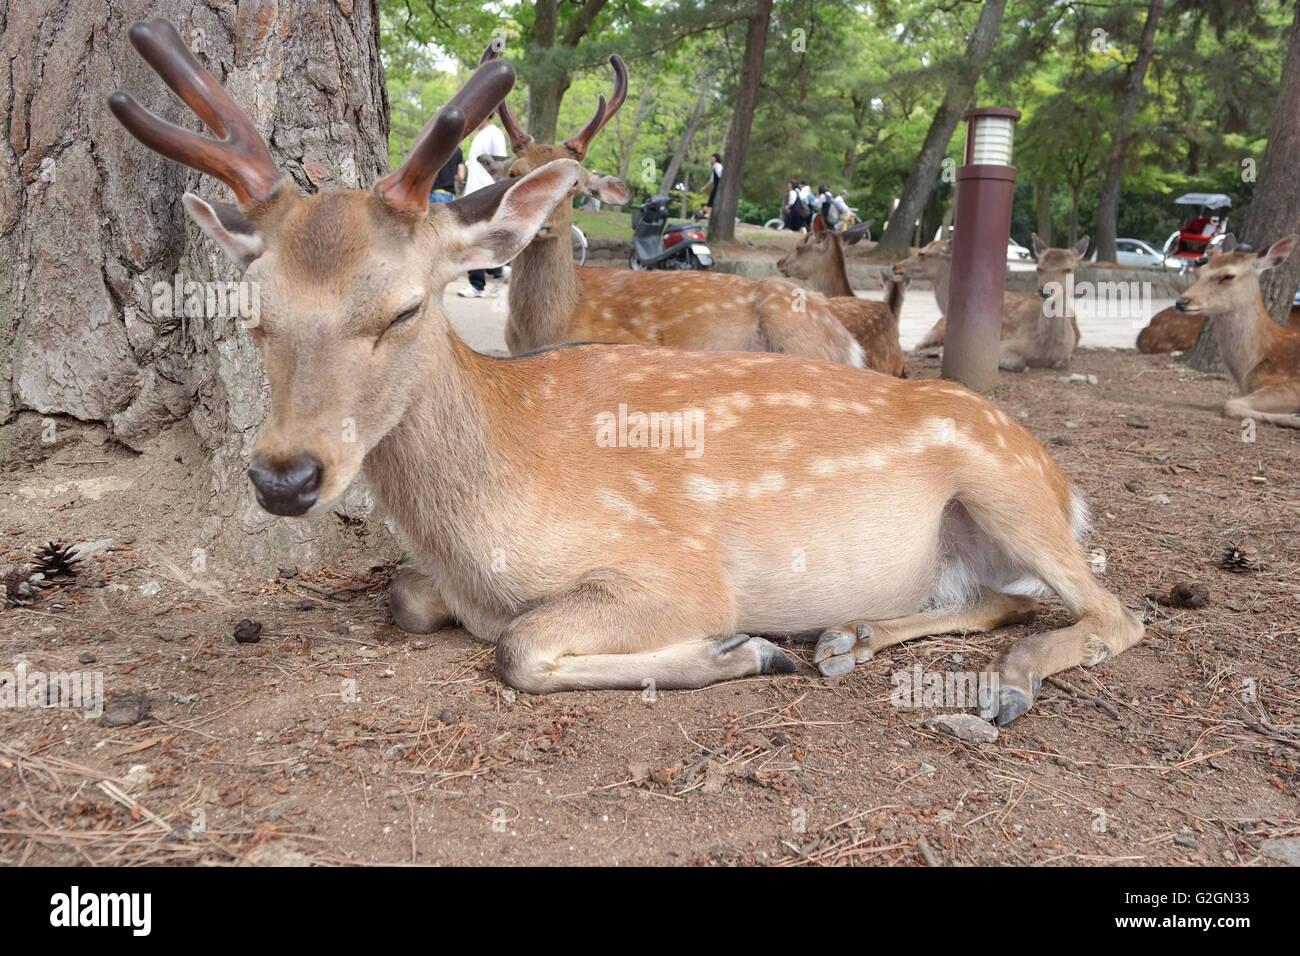 Nara Park Deer - Stock Image